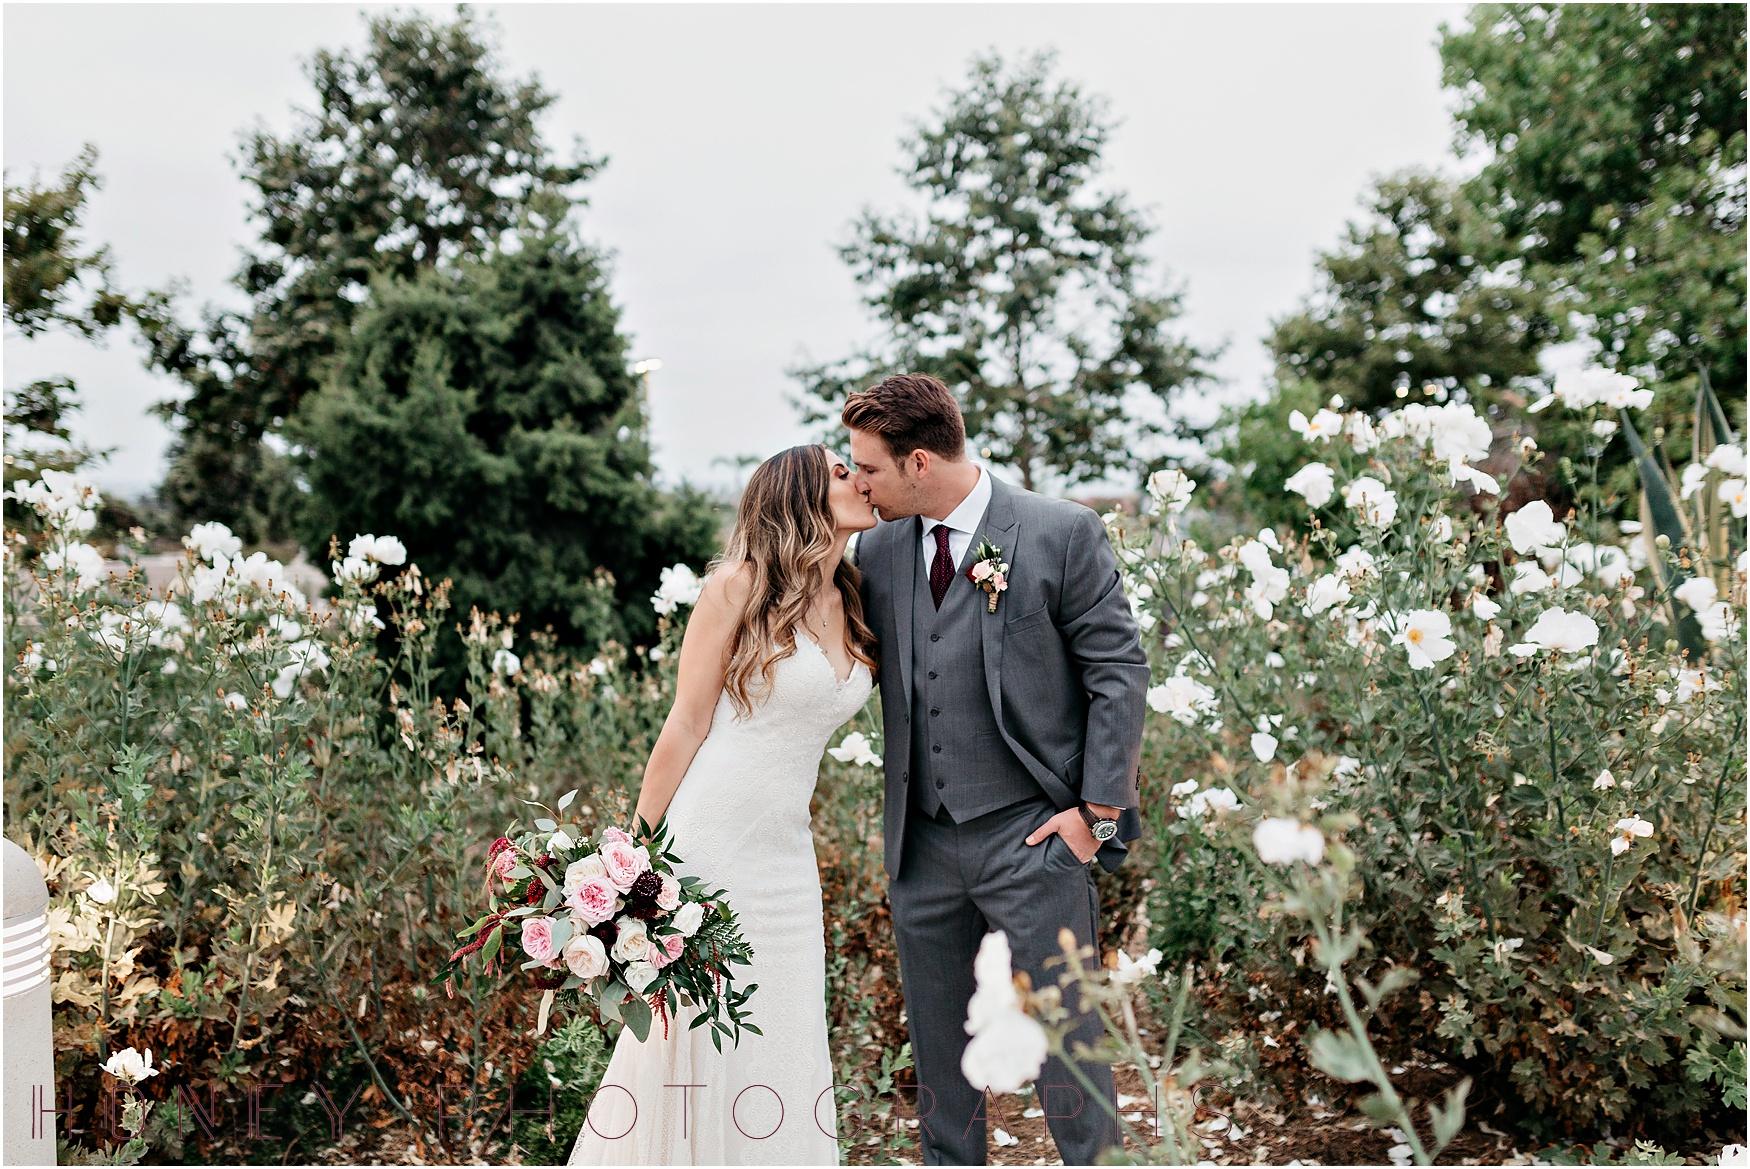 garden-classic-burgundy-jewel-tone-luxury-pacific-event-oceanside-wedding47.jpg